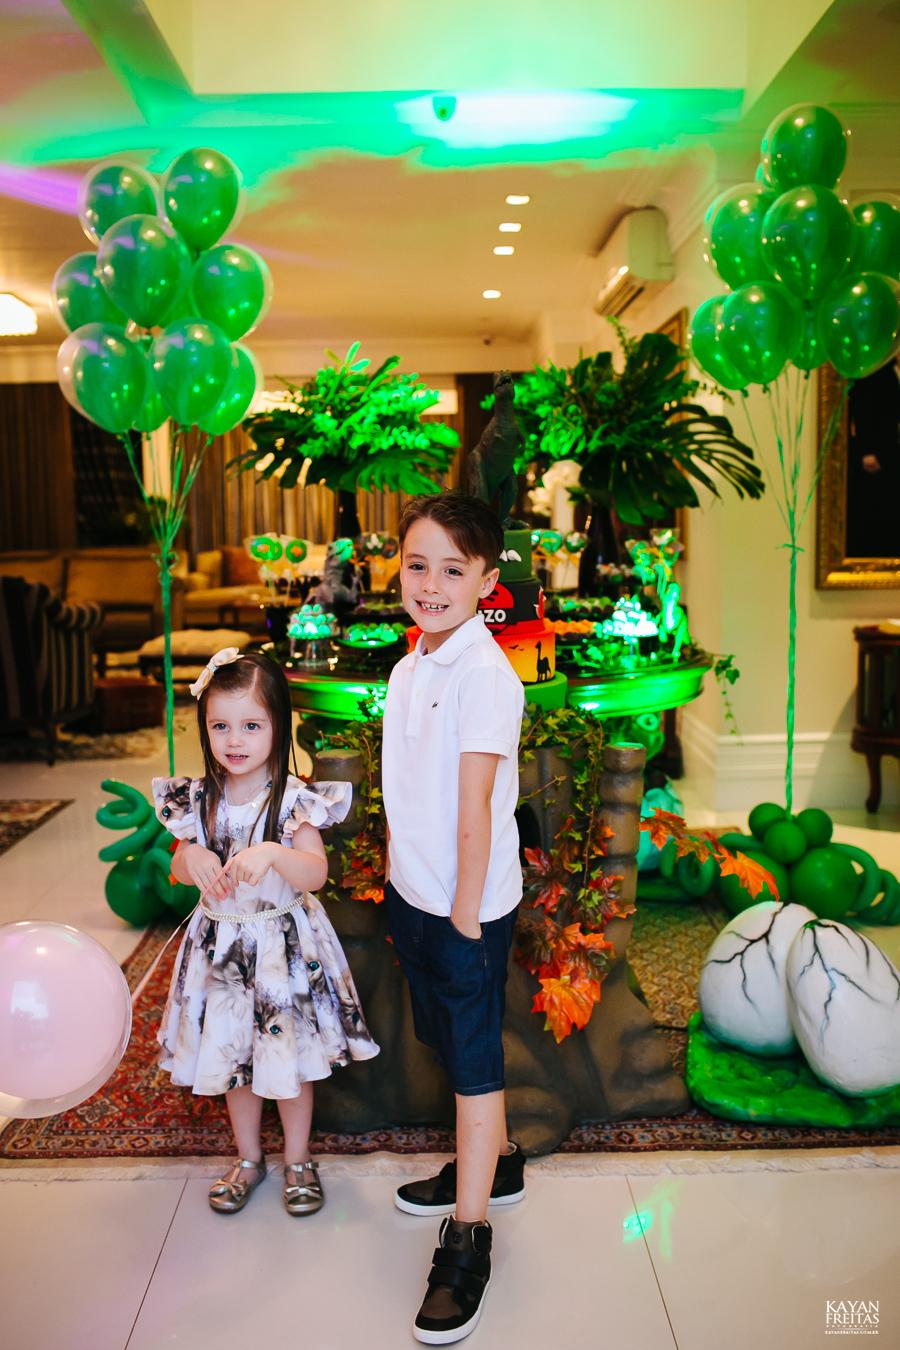 emily-enzo-aniversario-0022 Emily Keicy e Enzo Koerich - Aniversário Infantil em Florianópolis